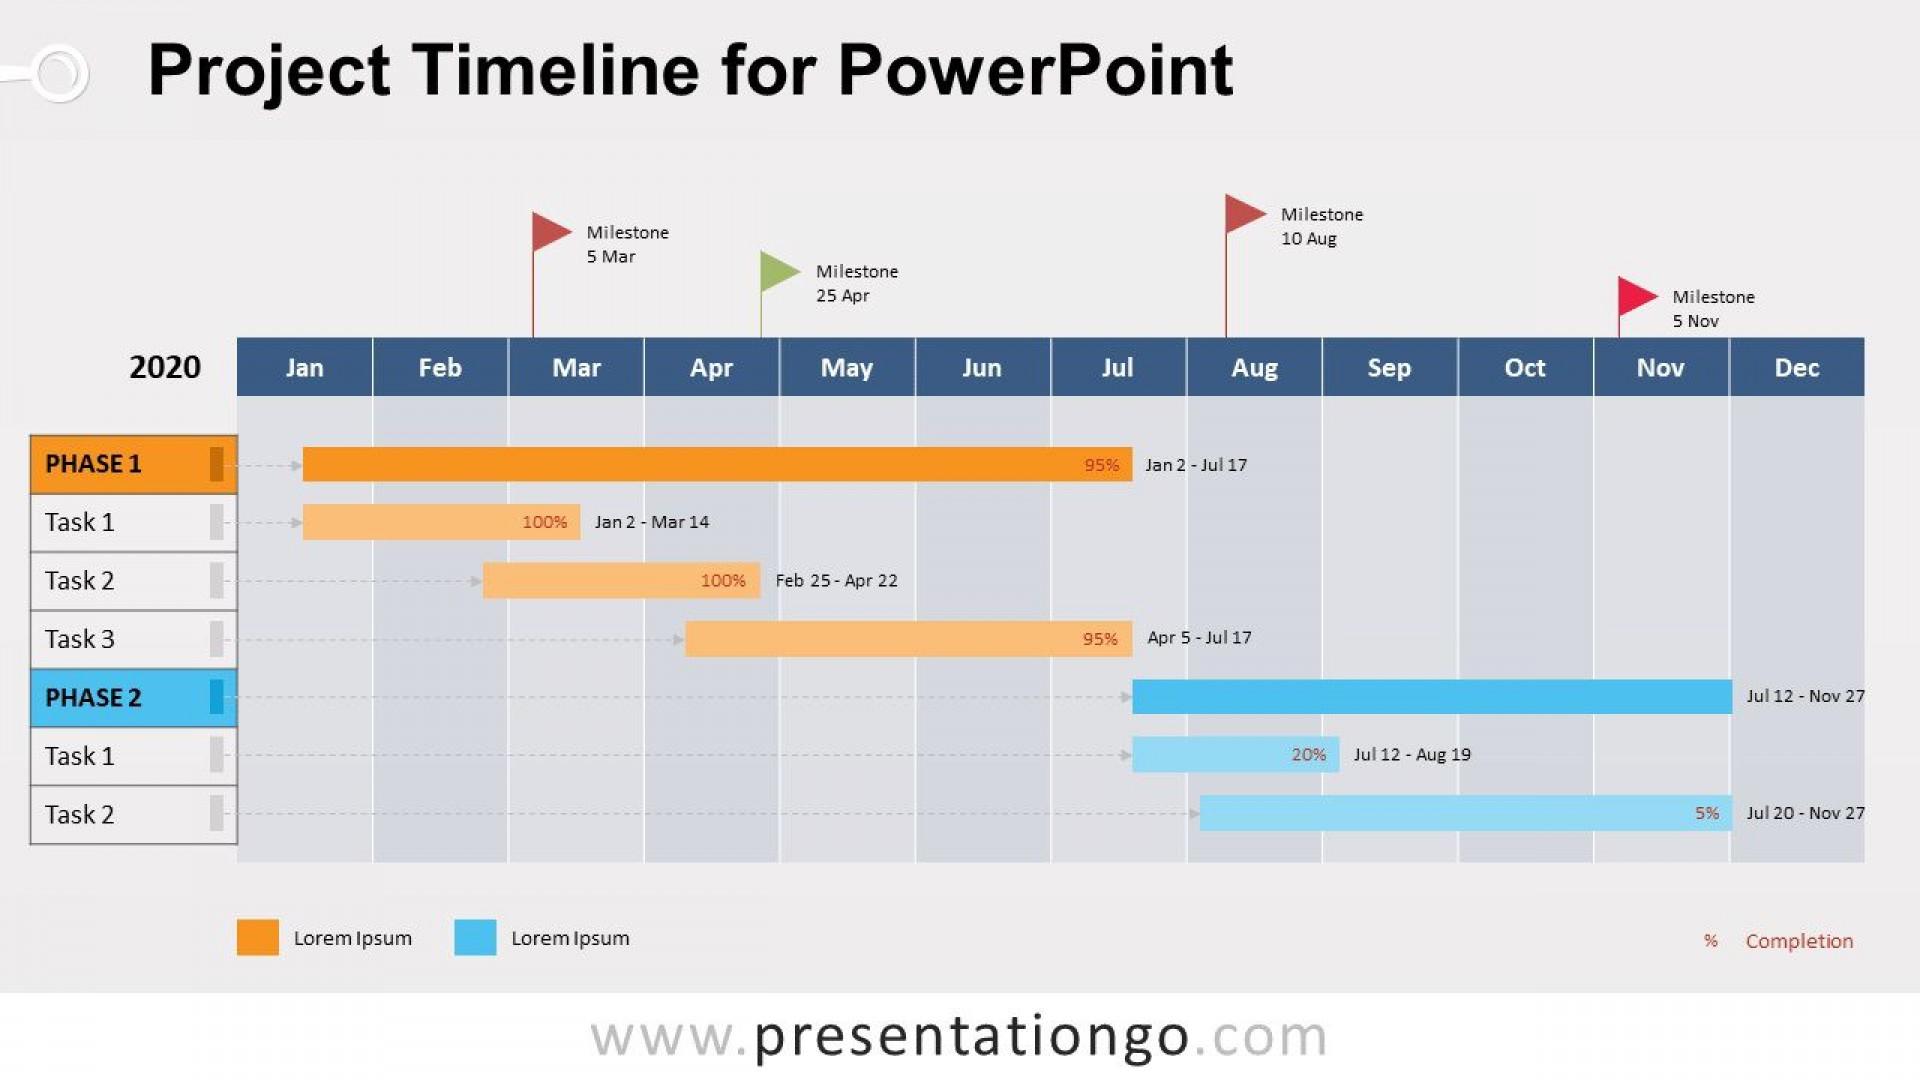 009 Impressive Project Management Timeline Template Idea  Plan Pmbok Planner1920